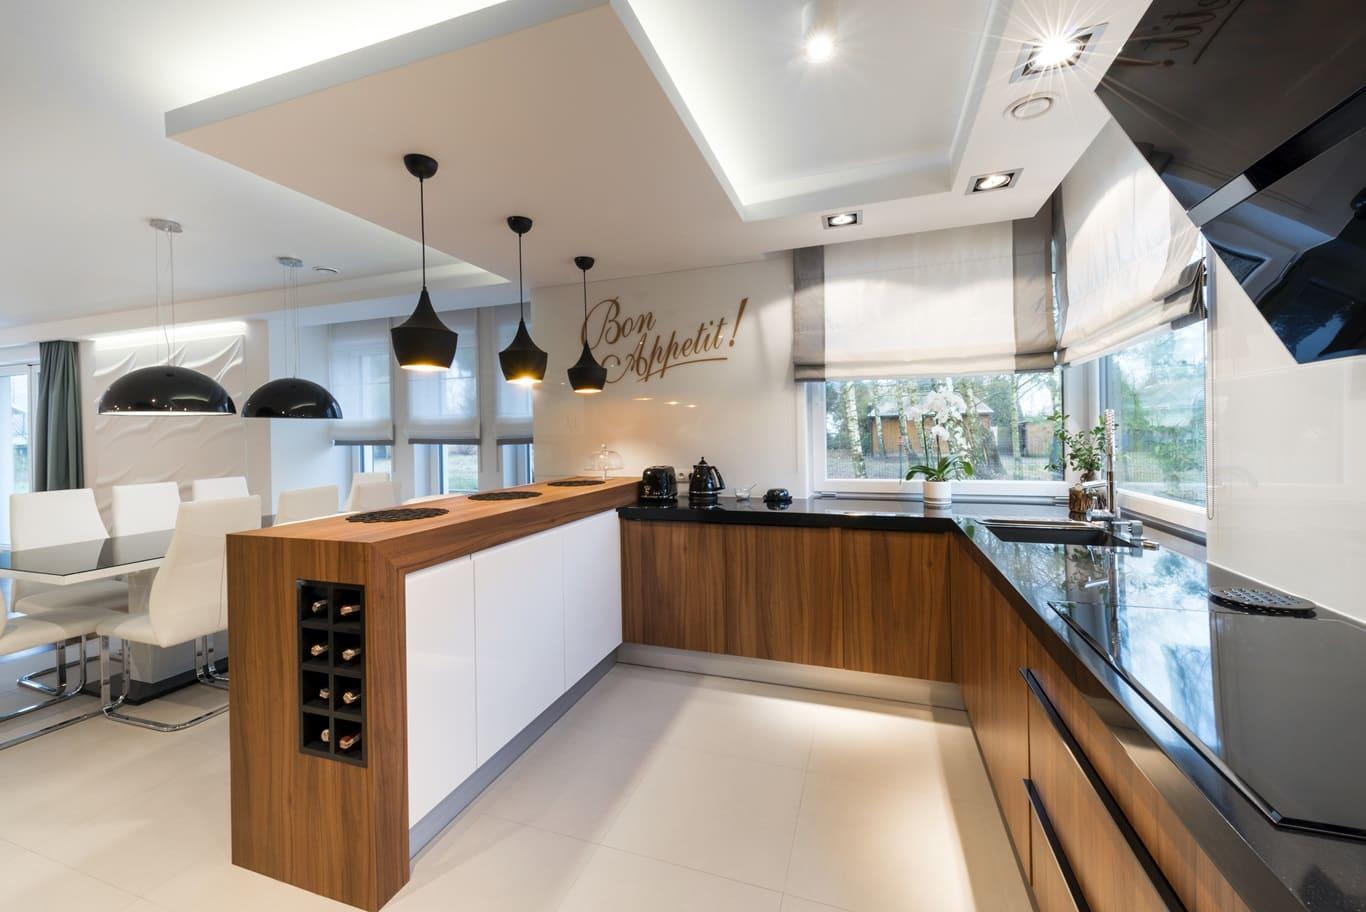 Освещение кухни в стиле минимализм